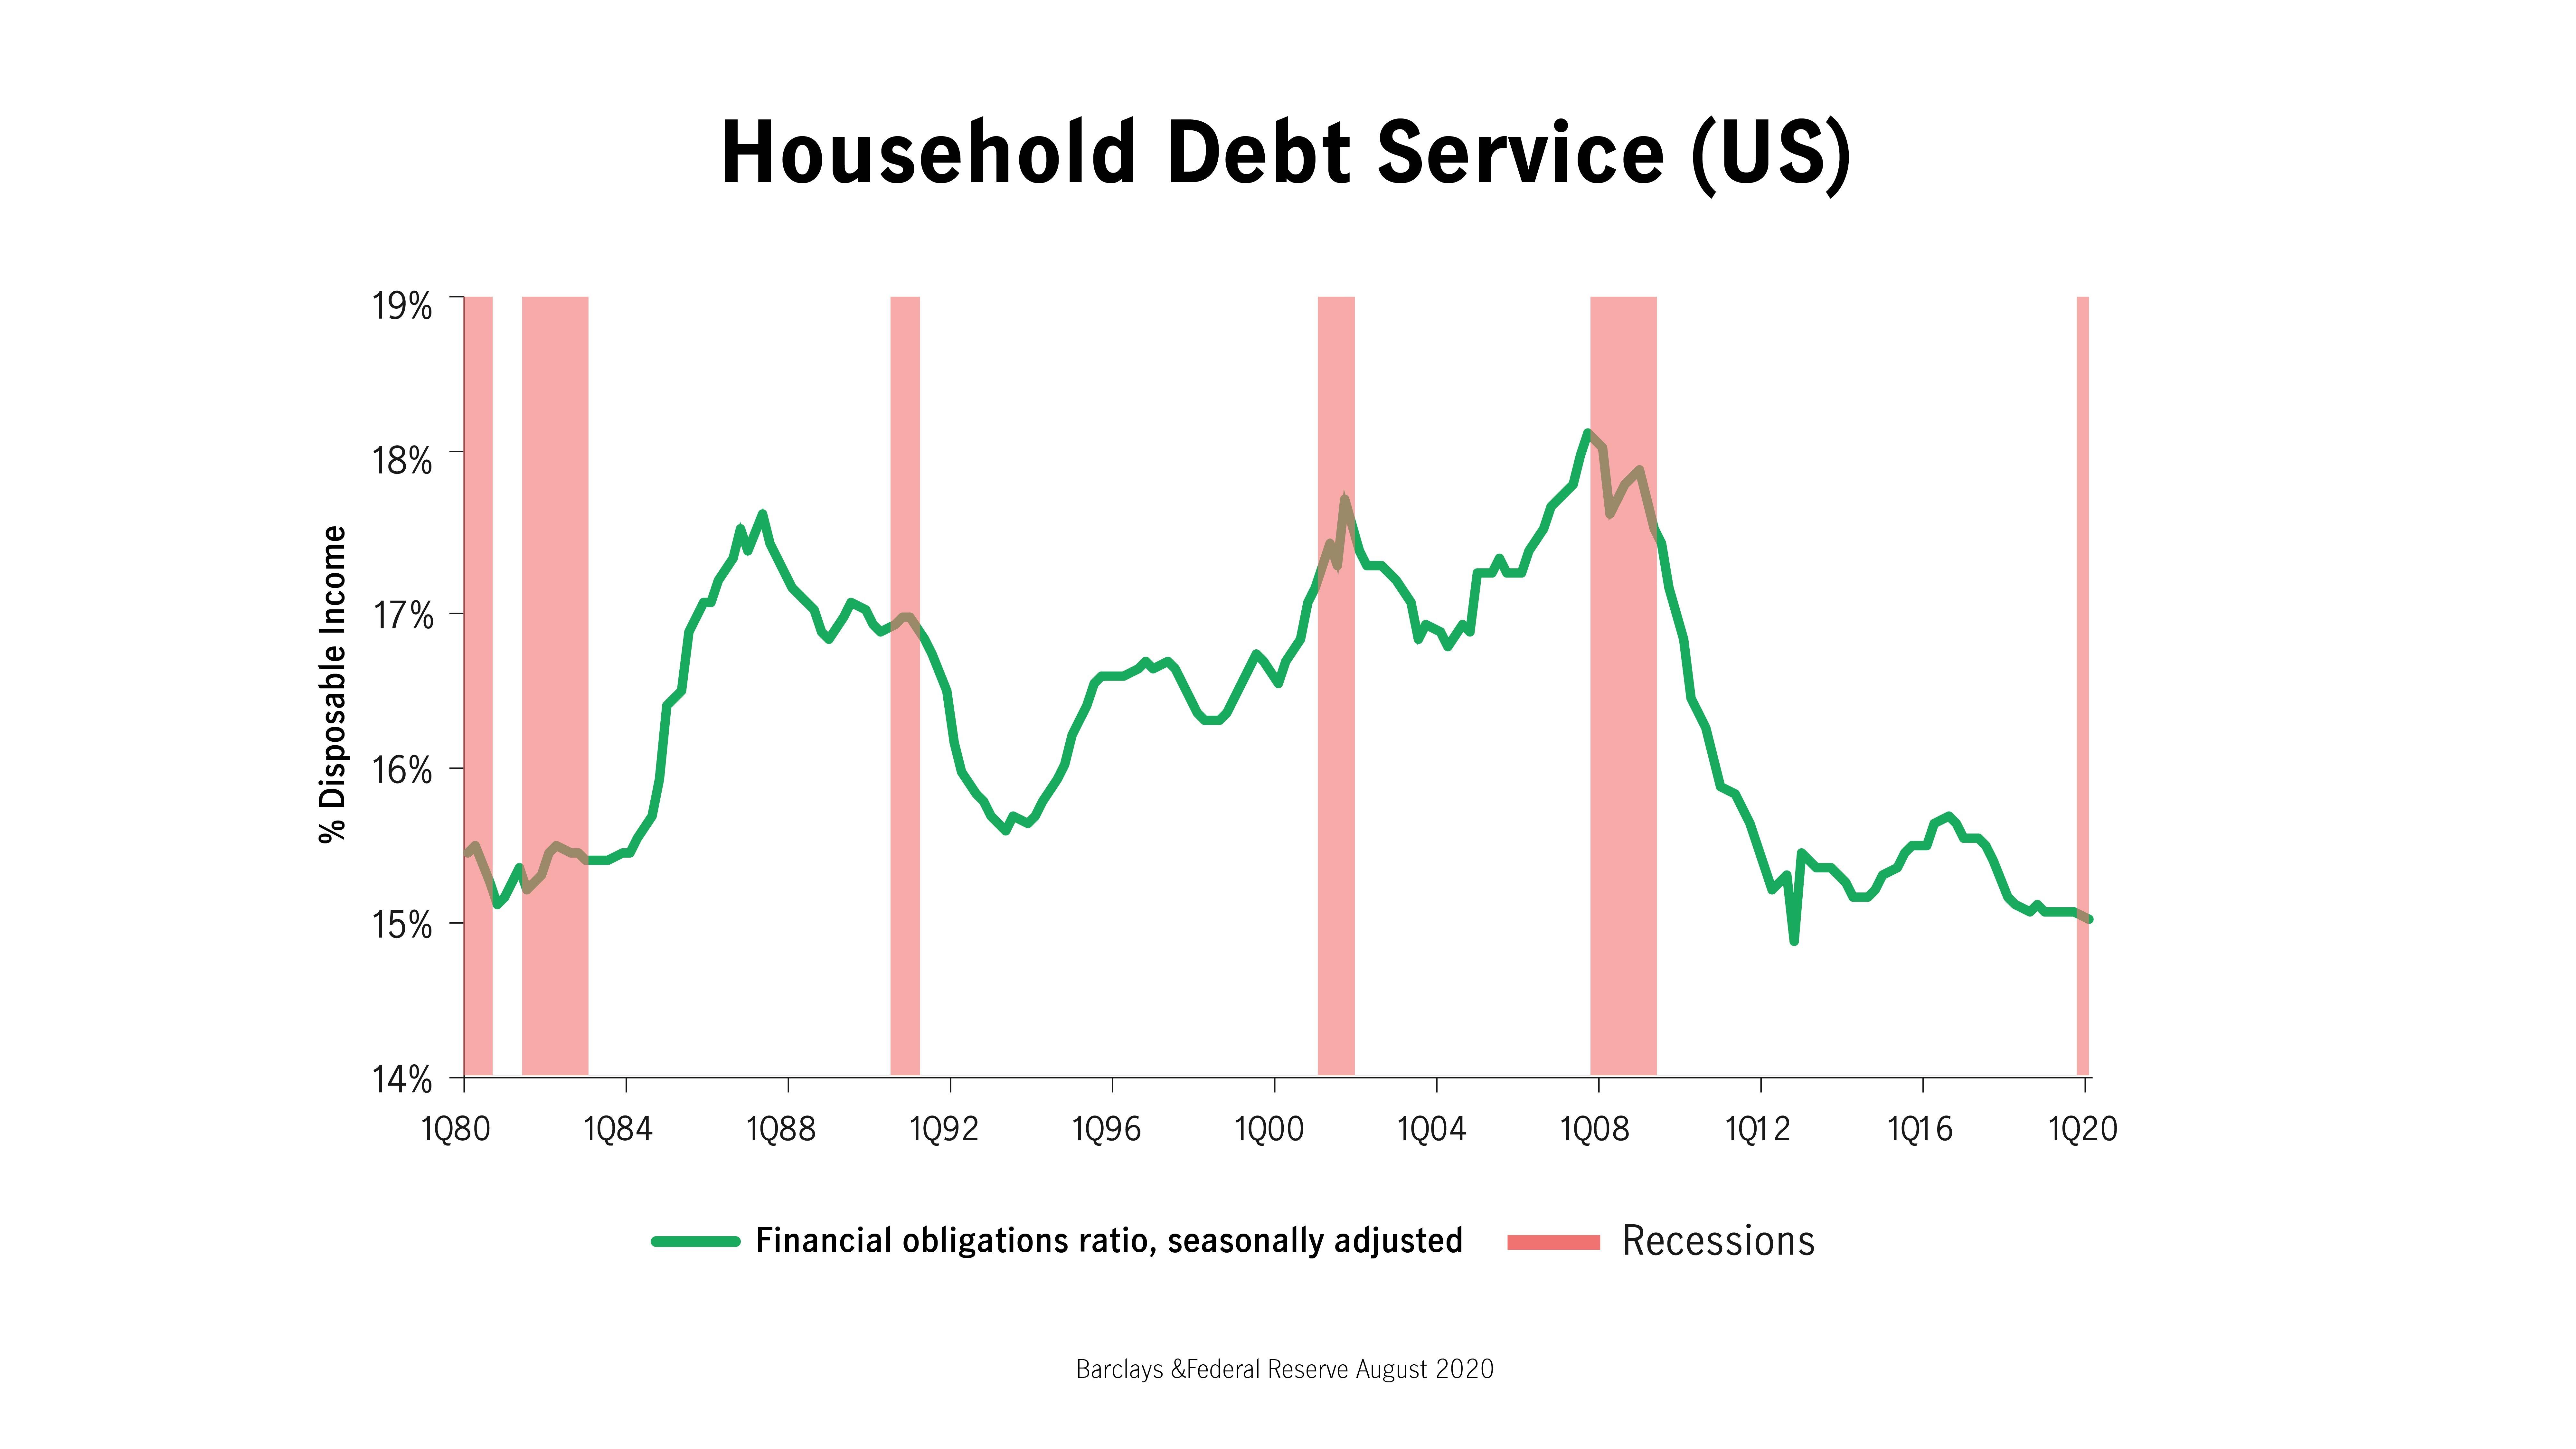 Household debt service (US)